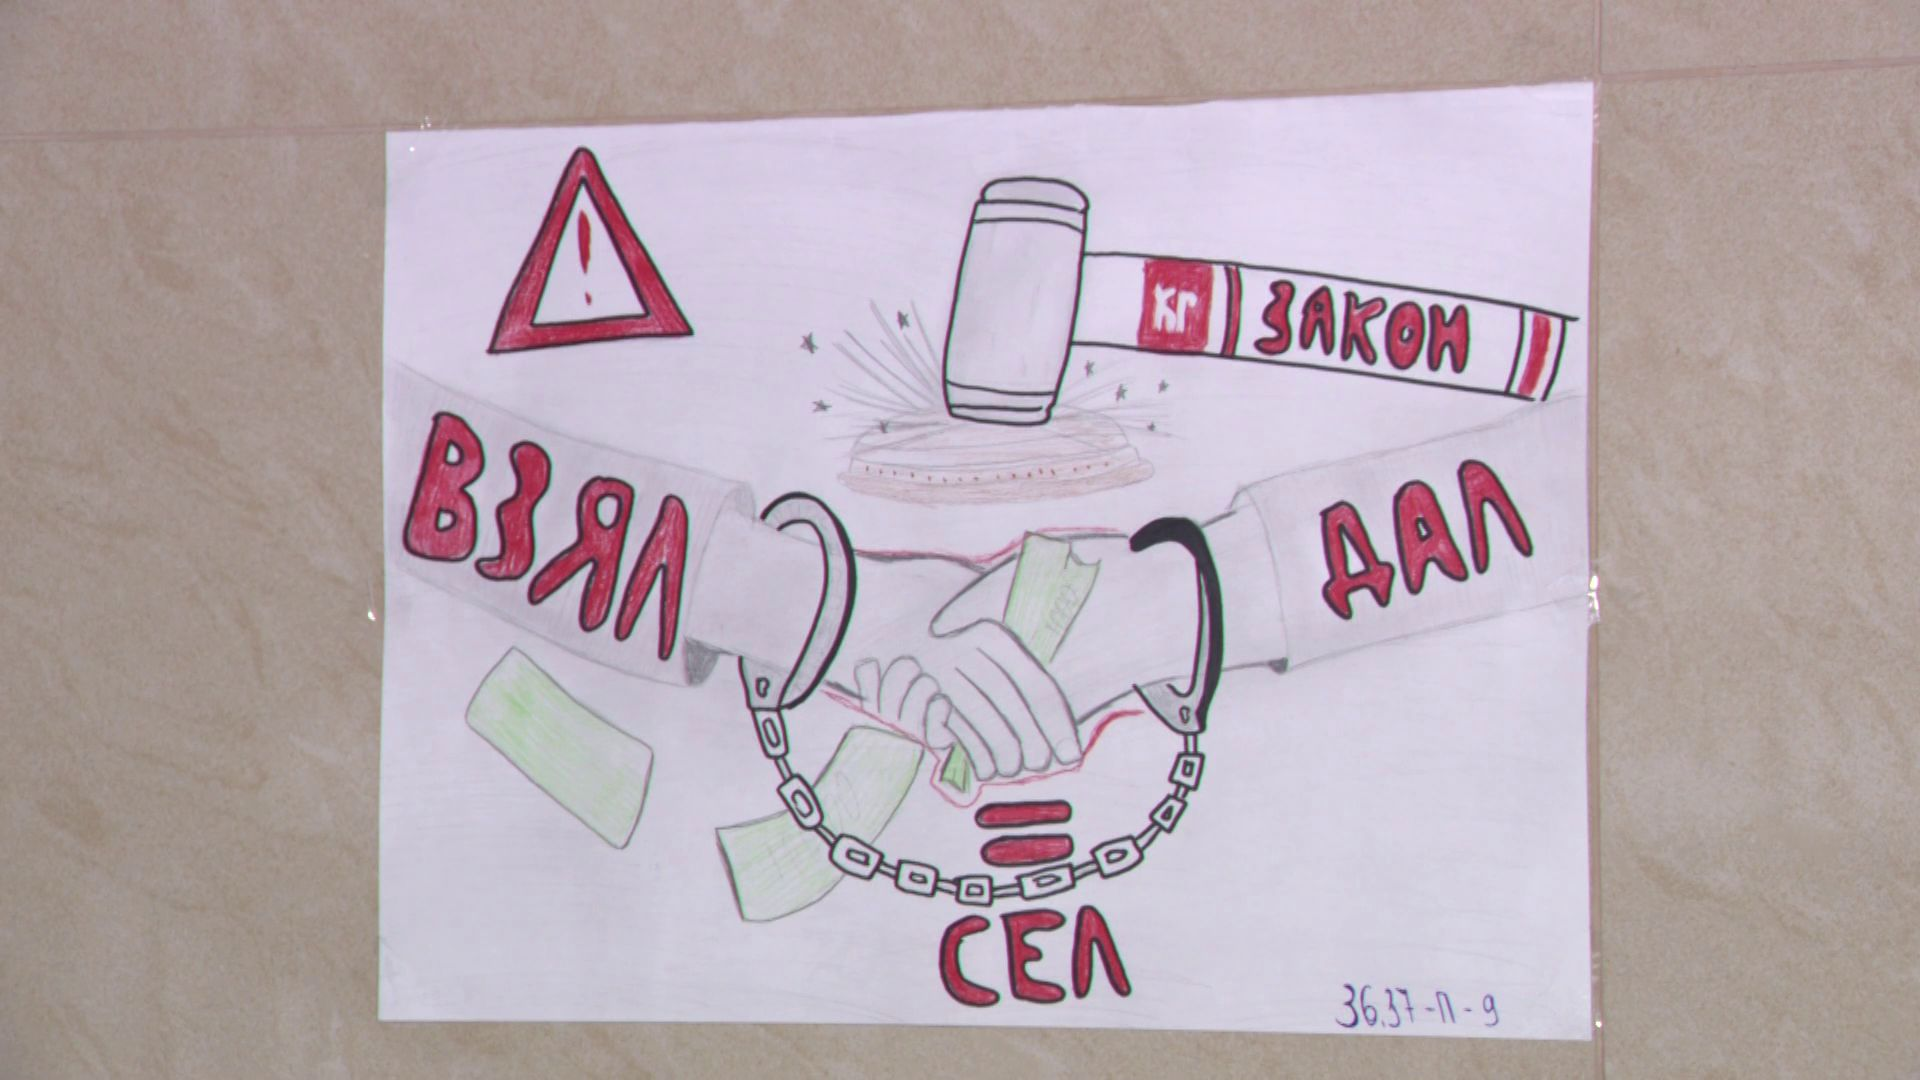 Ярославским студентам прочитали лекцию о коррупции